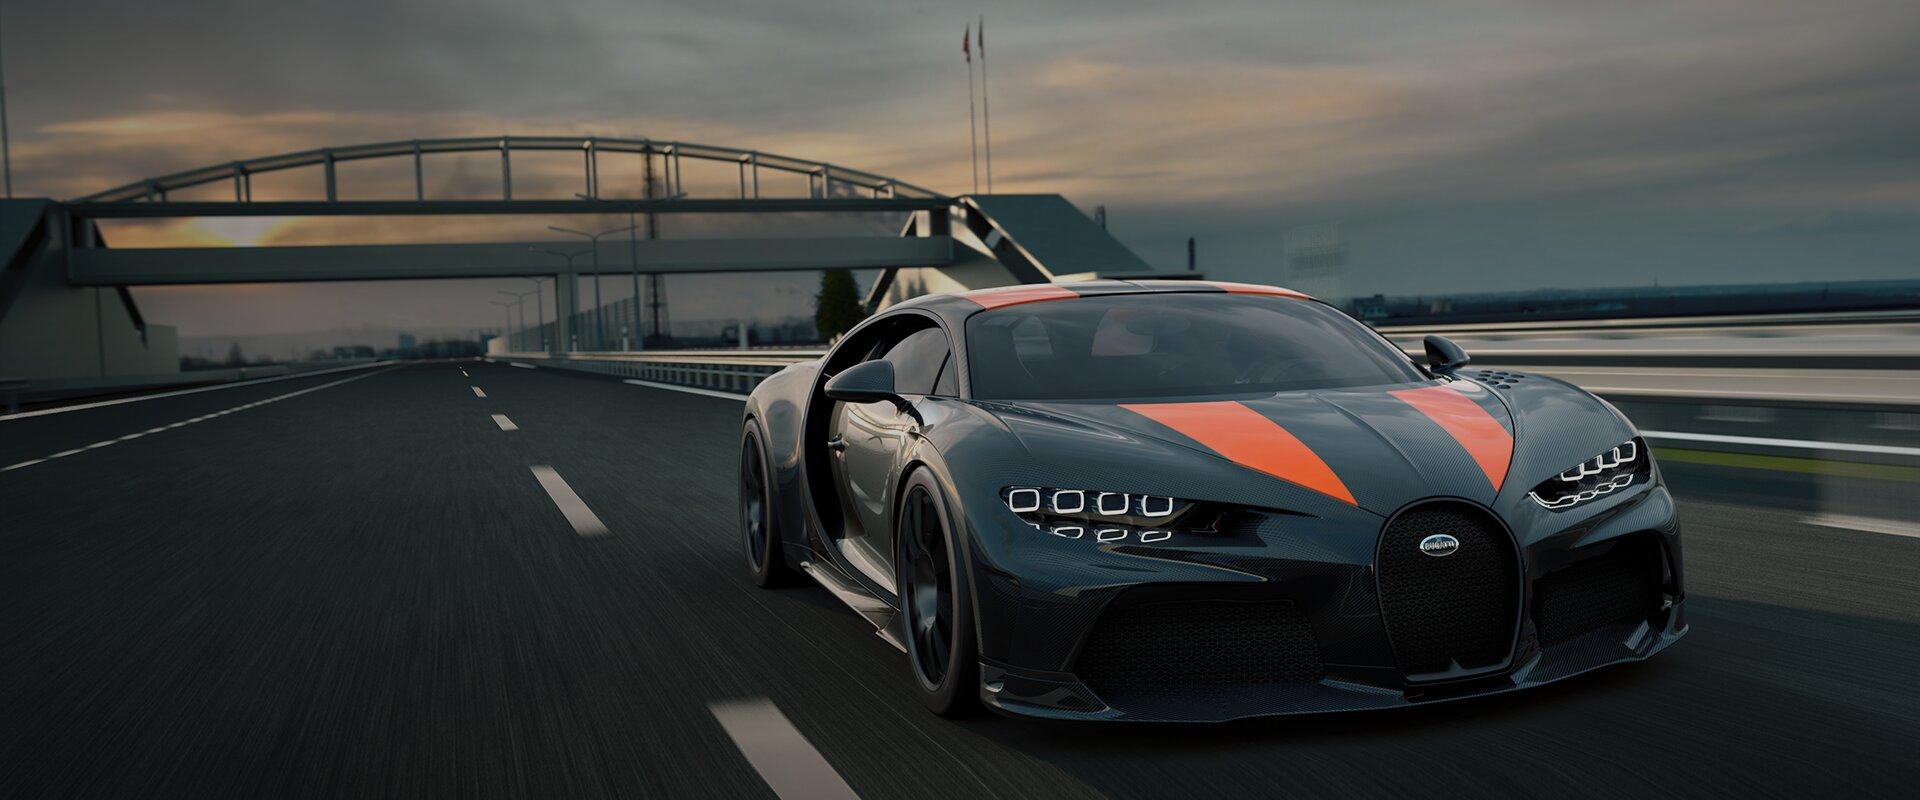 Bugatti Chiron Super Sport 300+, Cinco hiperdeportivos capaces de superar los 400 km/h